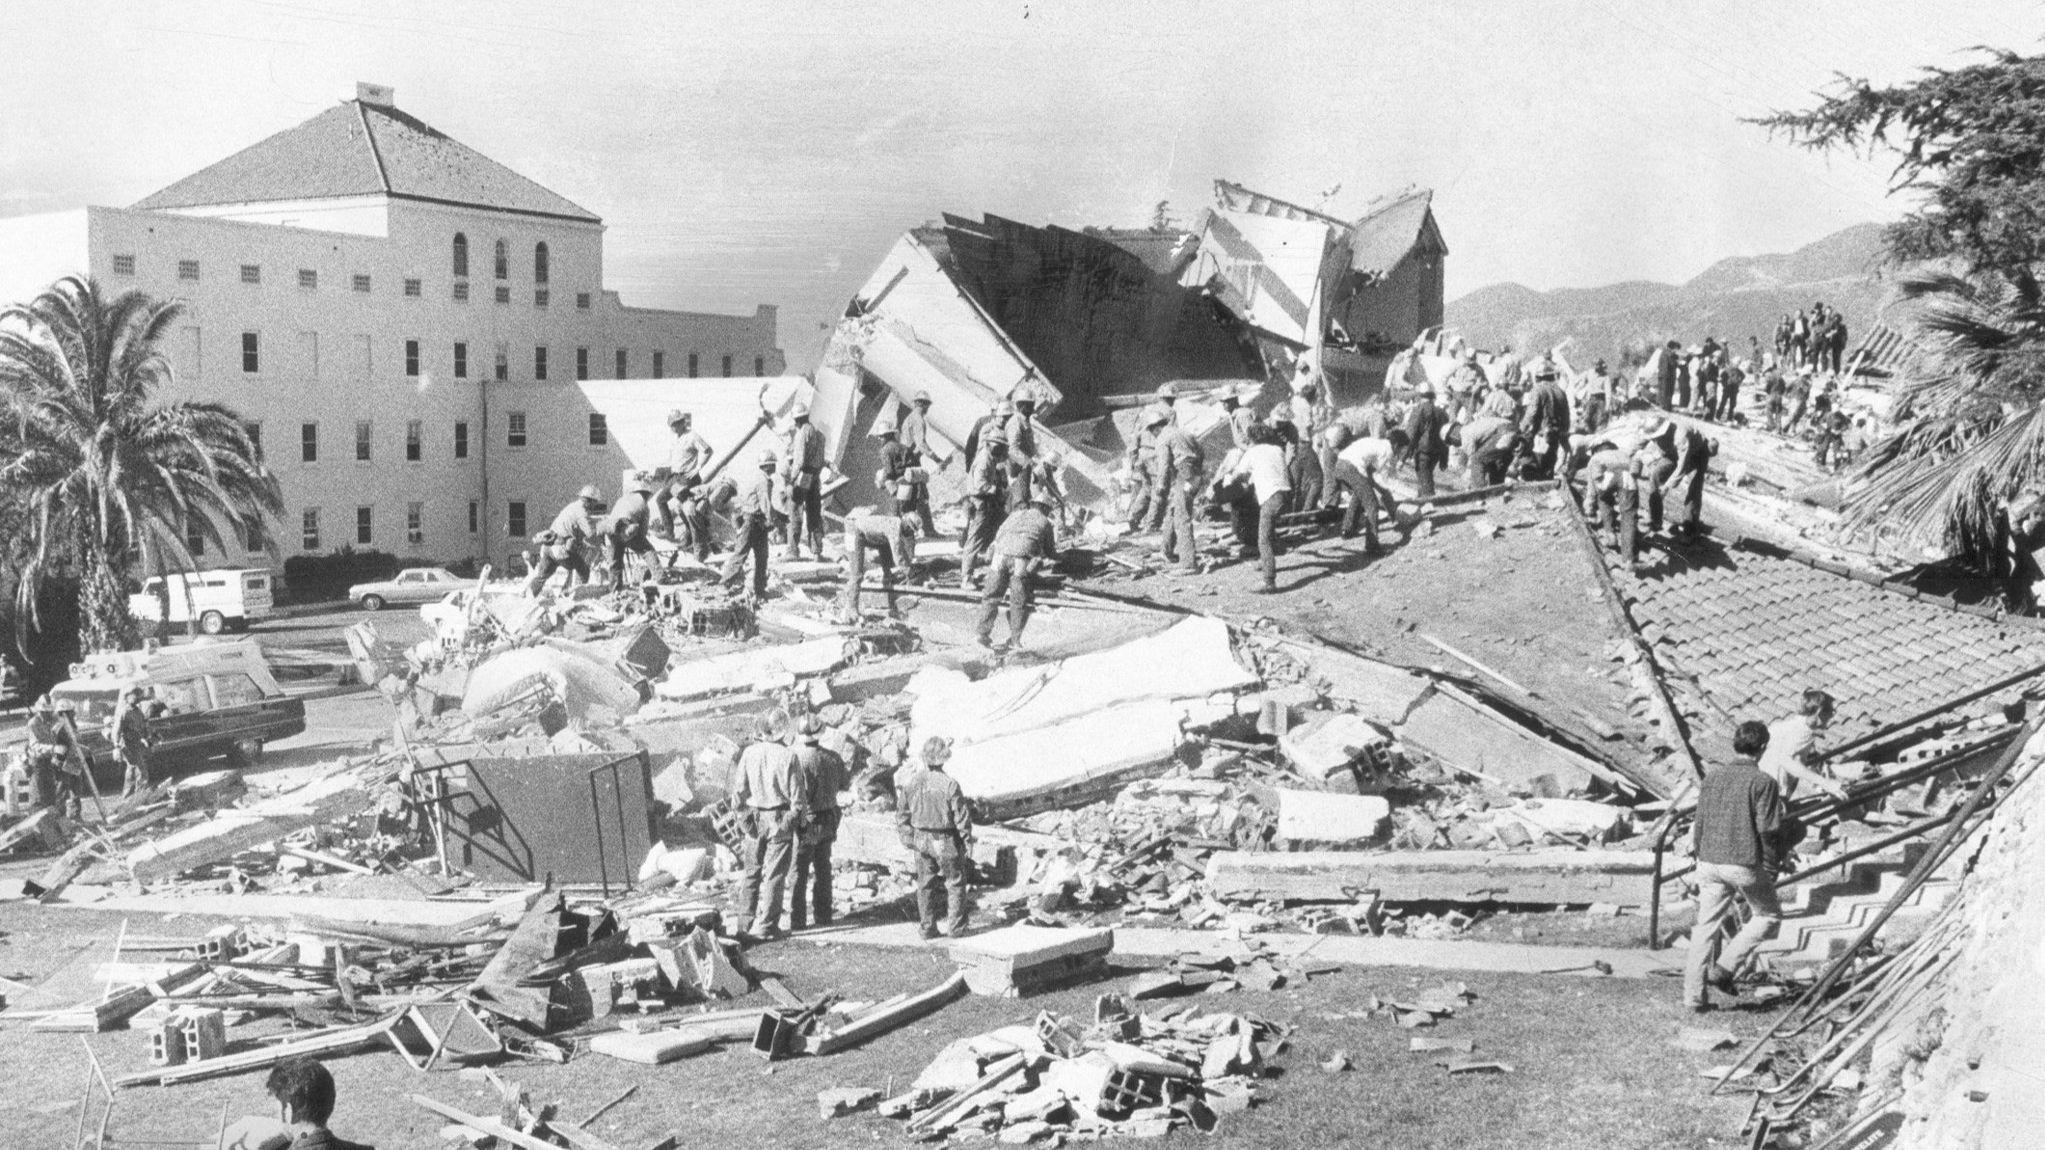 1971 Sylmar earthquake damage